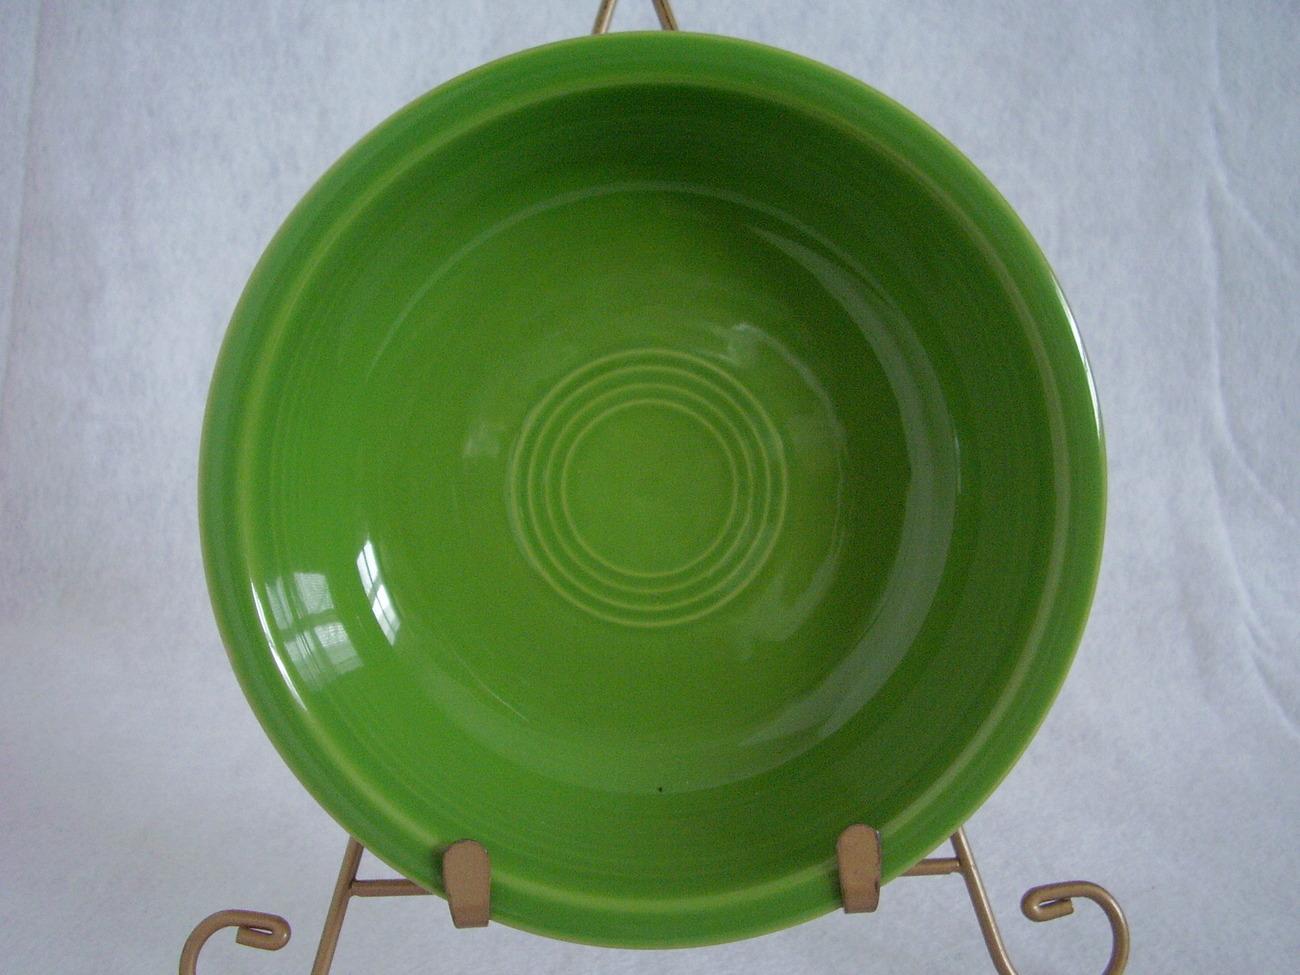 Fiesta Shamrock Stacking Soup Cereal Bowl Fiestaware Contemporary